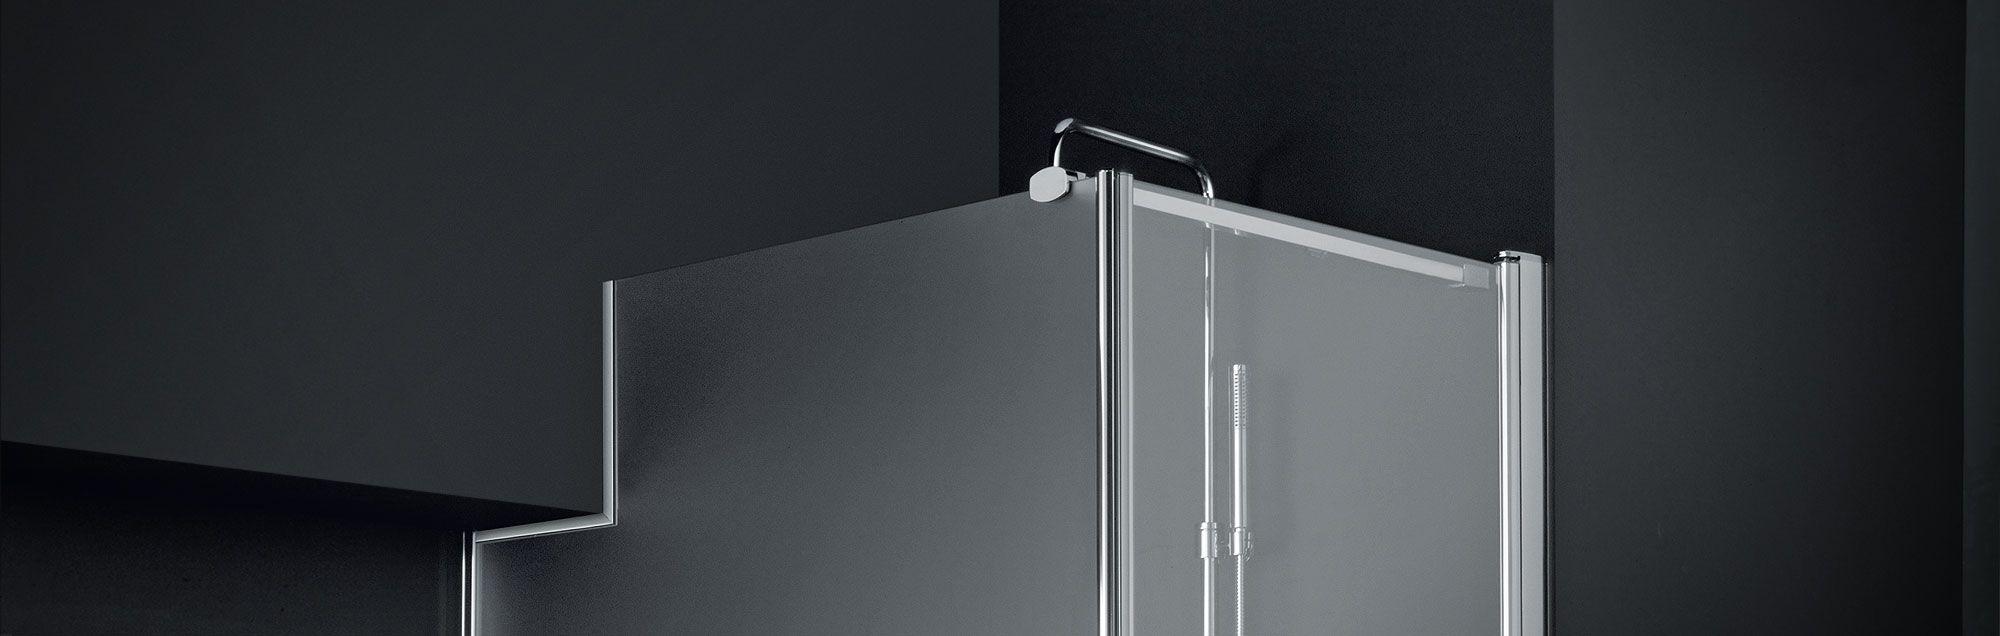 Mamparas especiales de bañera a medida PROFILTEK